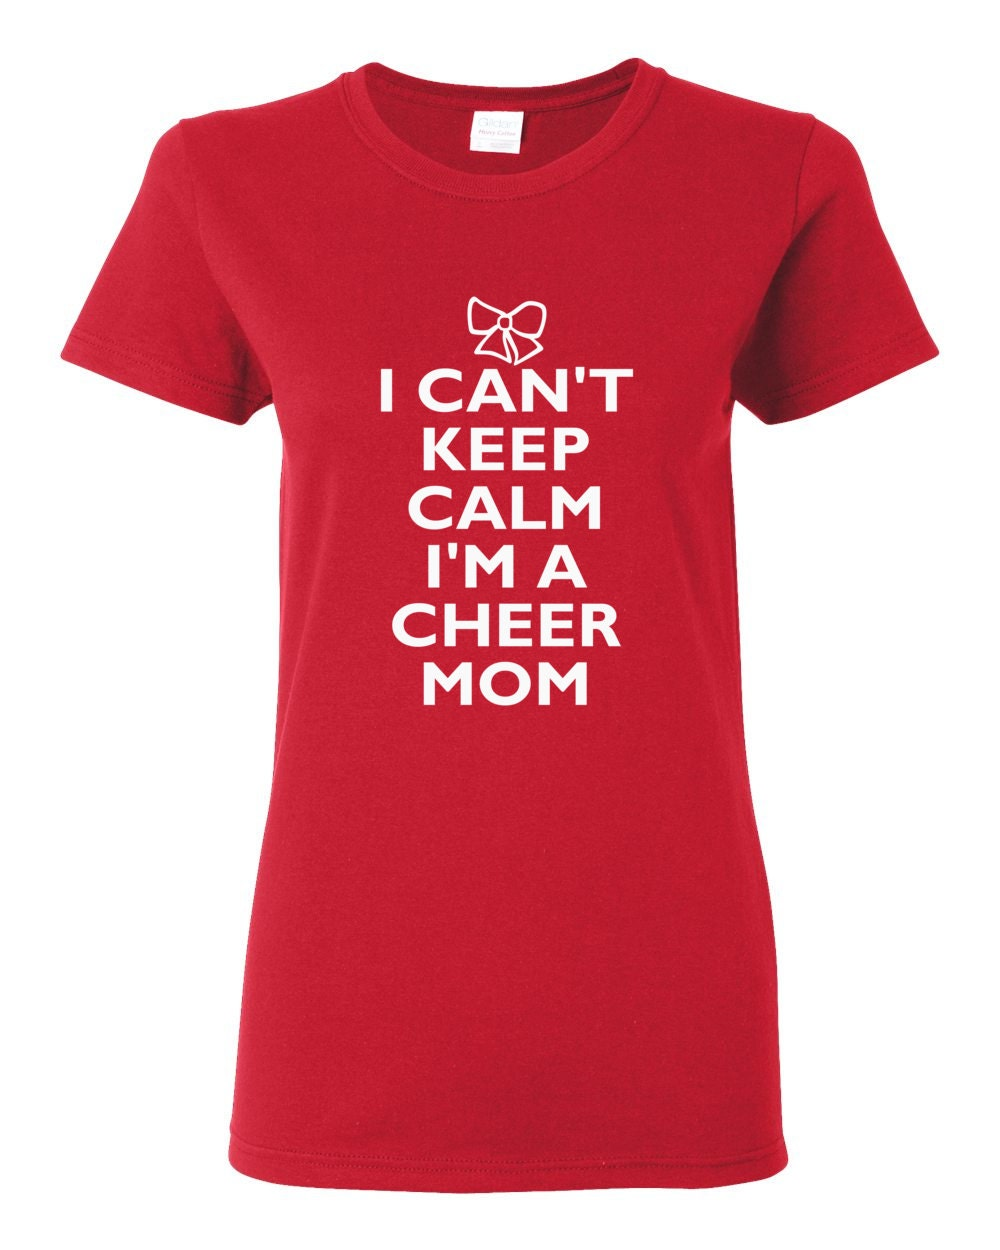 Cheer Life - I Can't Keep Calm I'm A Cheer Mom Womens T-Shirt